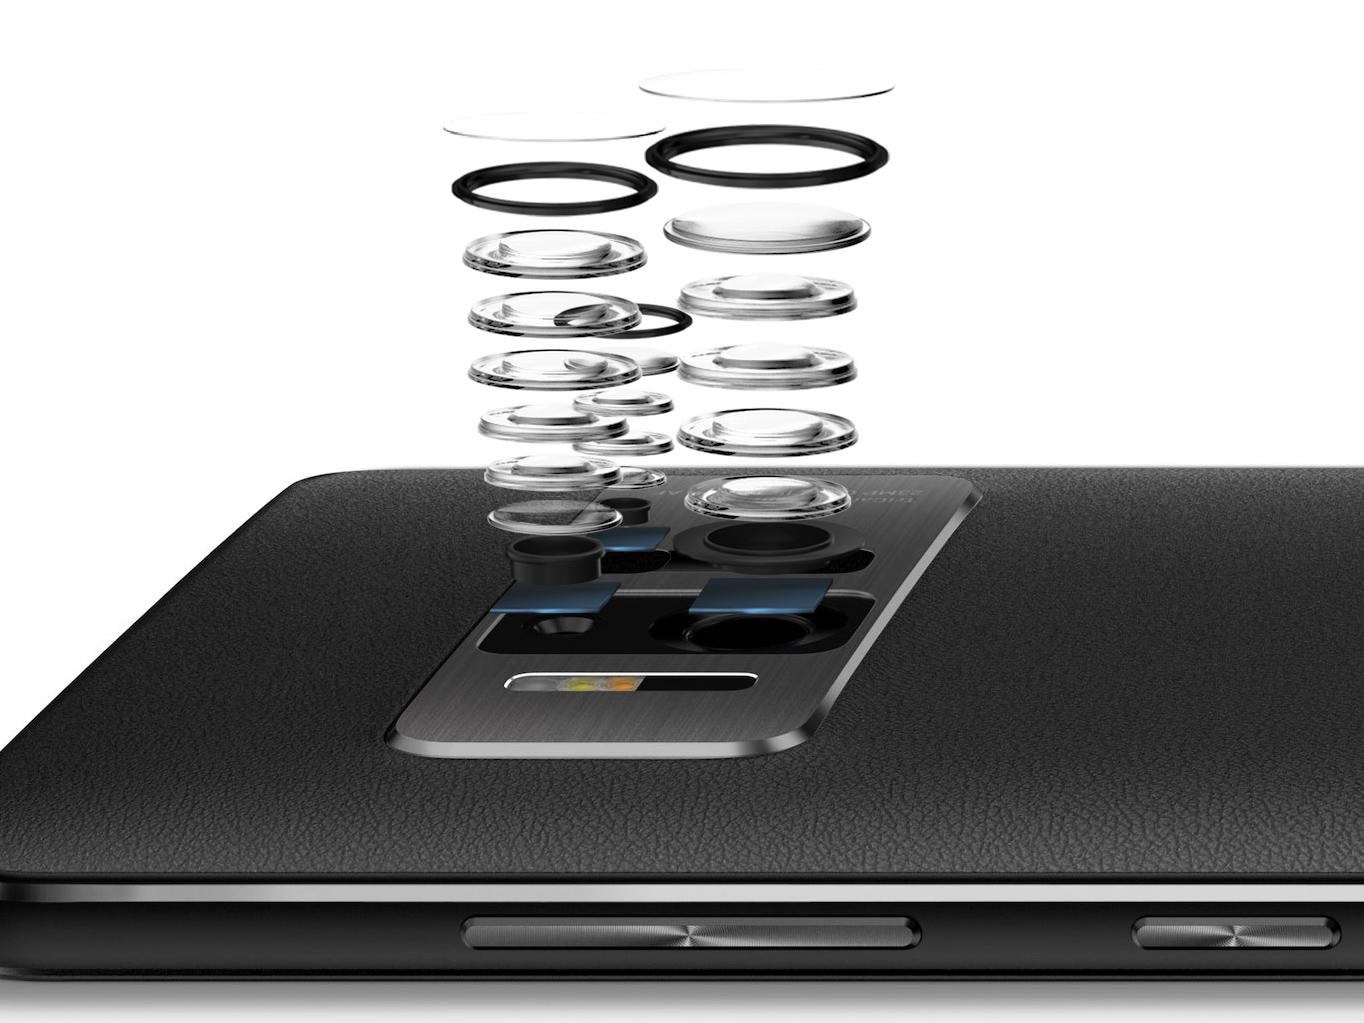 https://cdn.arstechnica.net/wp-content/uploads/2017/01/Asus-Zenfone-AR-3.jpg